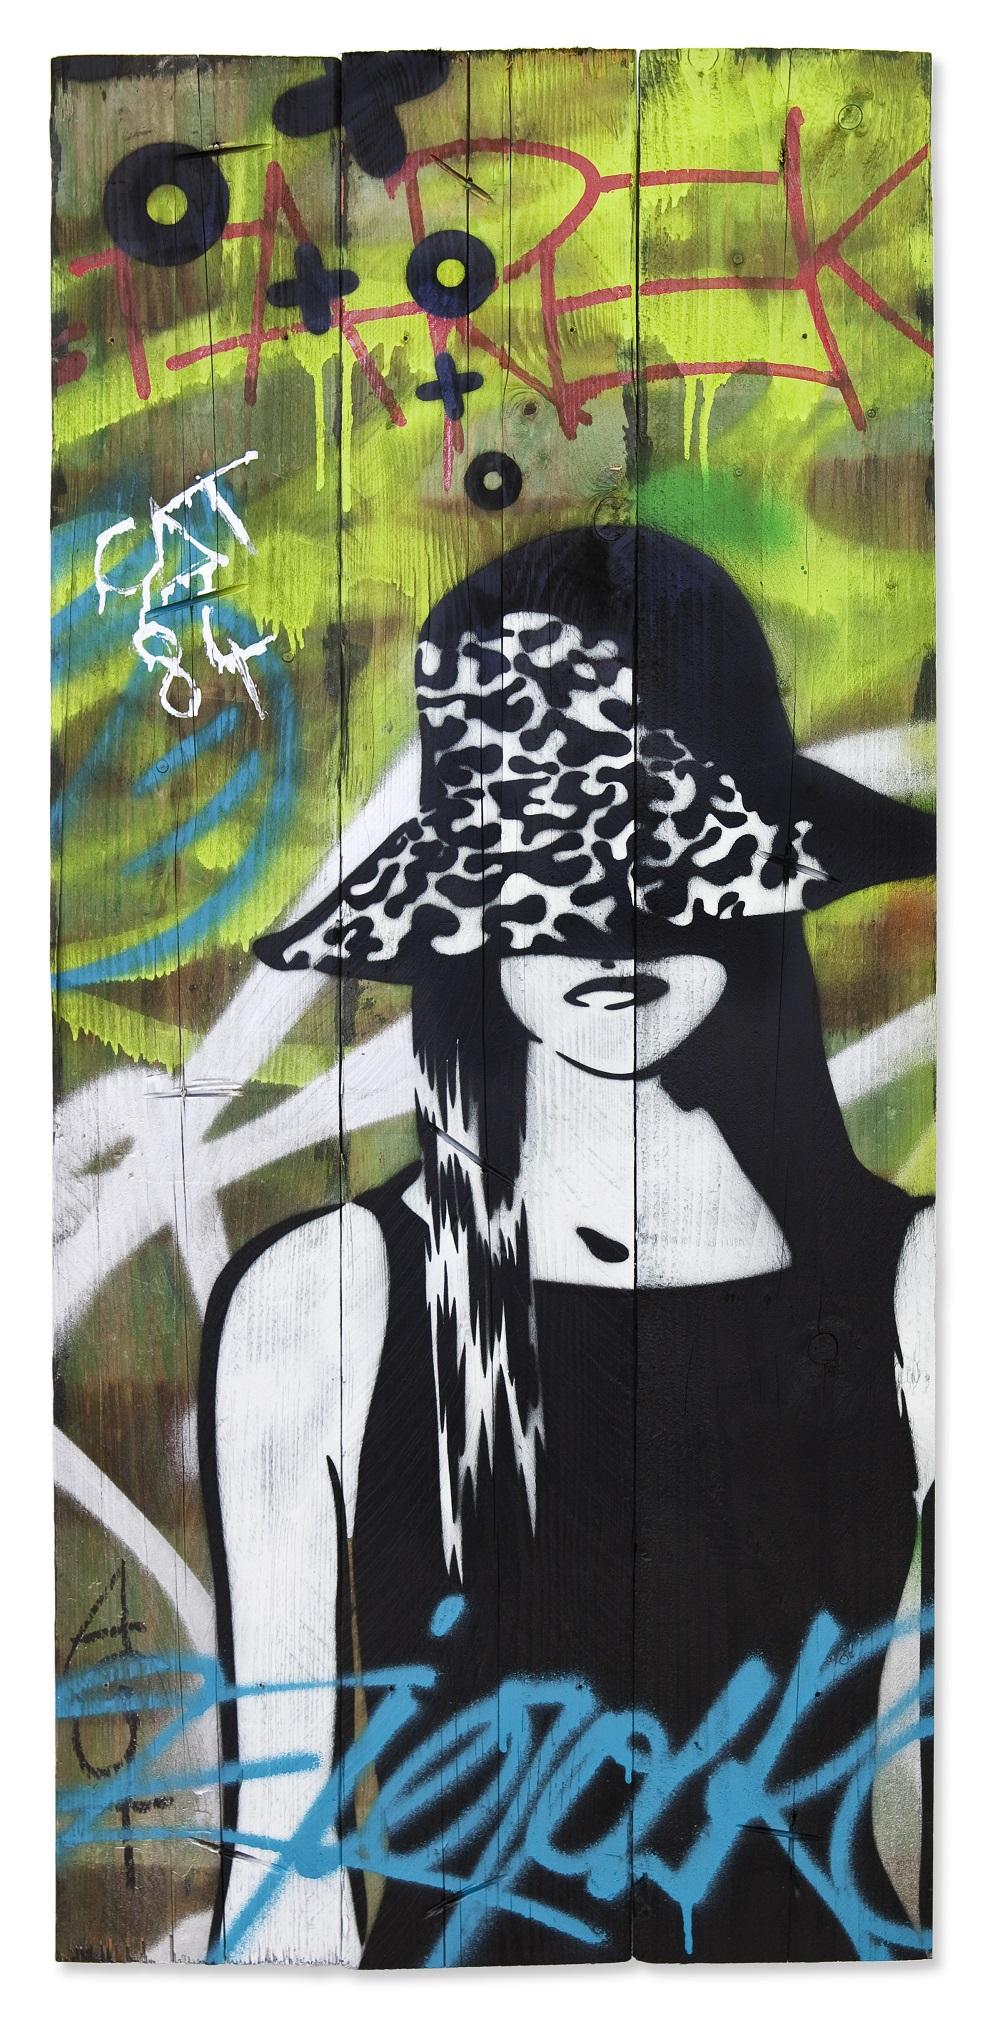 XOOOOX - Chloe (Cat84), 2017, 98 x 45 cm, Sprühfarbe auf Holz